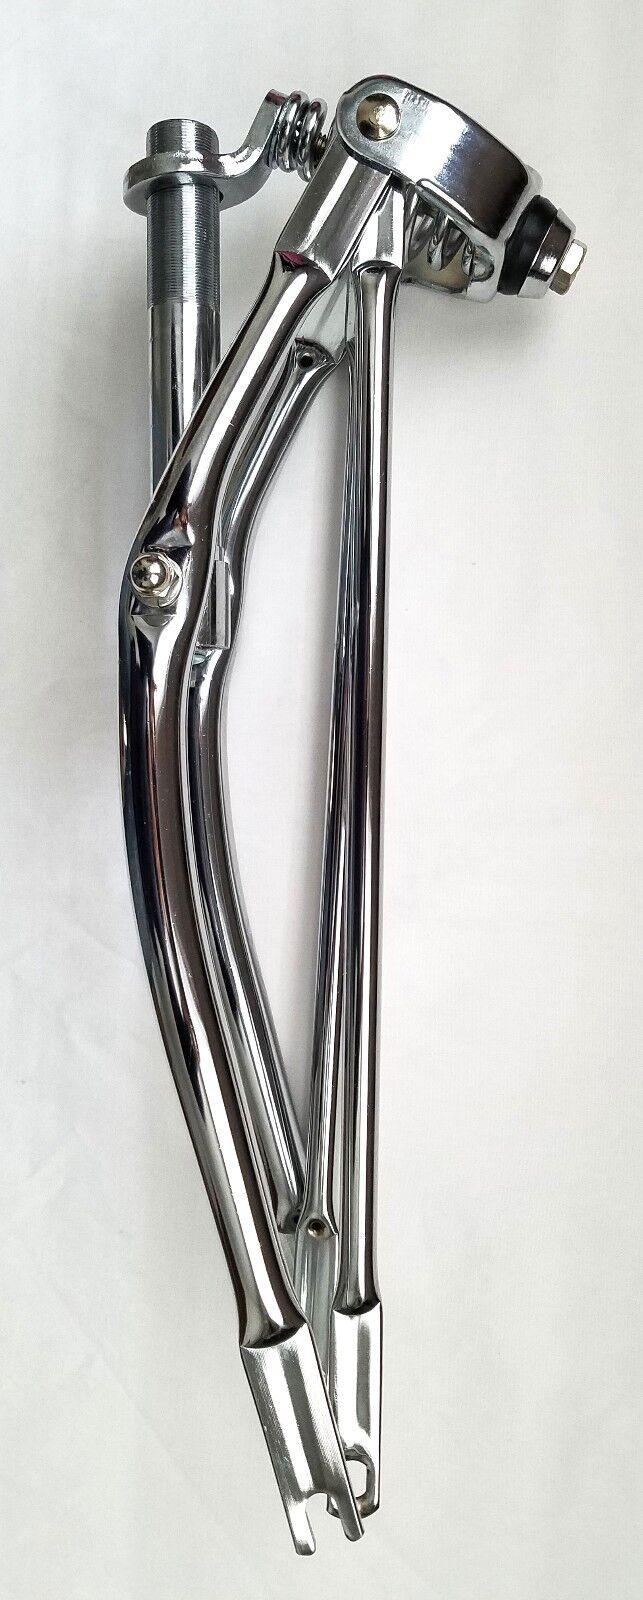 20  Classic Lowrider Spring Fork Chrome